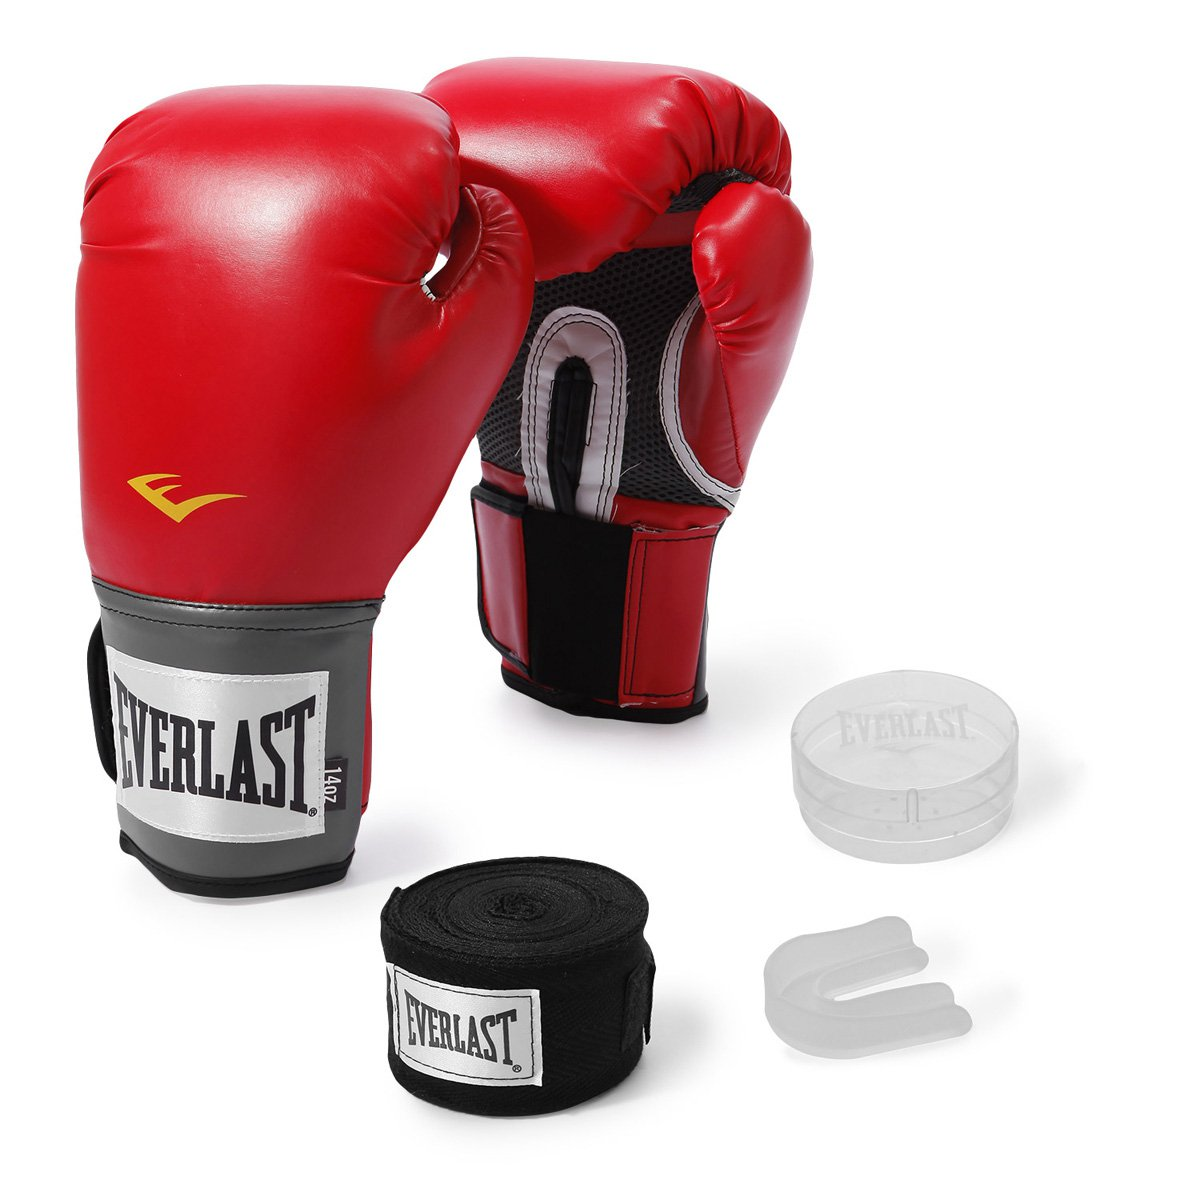 de0f42097 Kit Luva de Boxe Everlast Training 14 Oz + Bandagem - Shopping TudoAzul